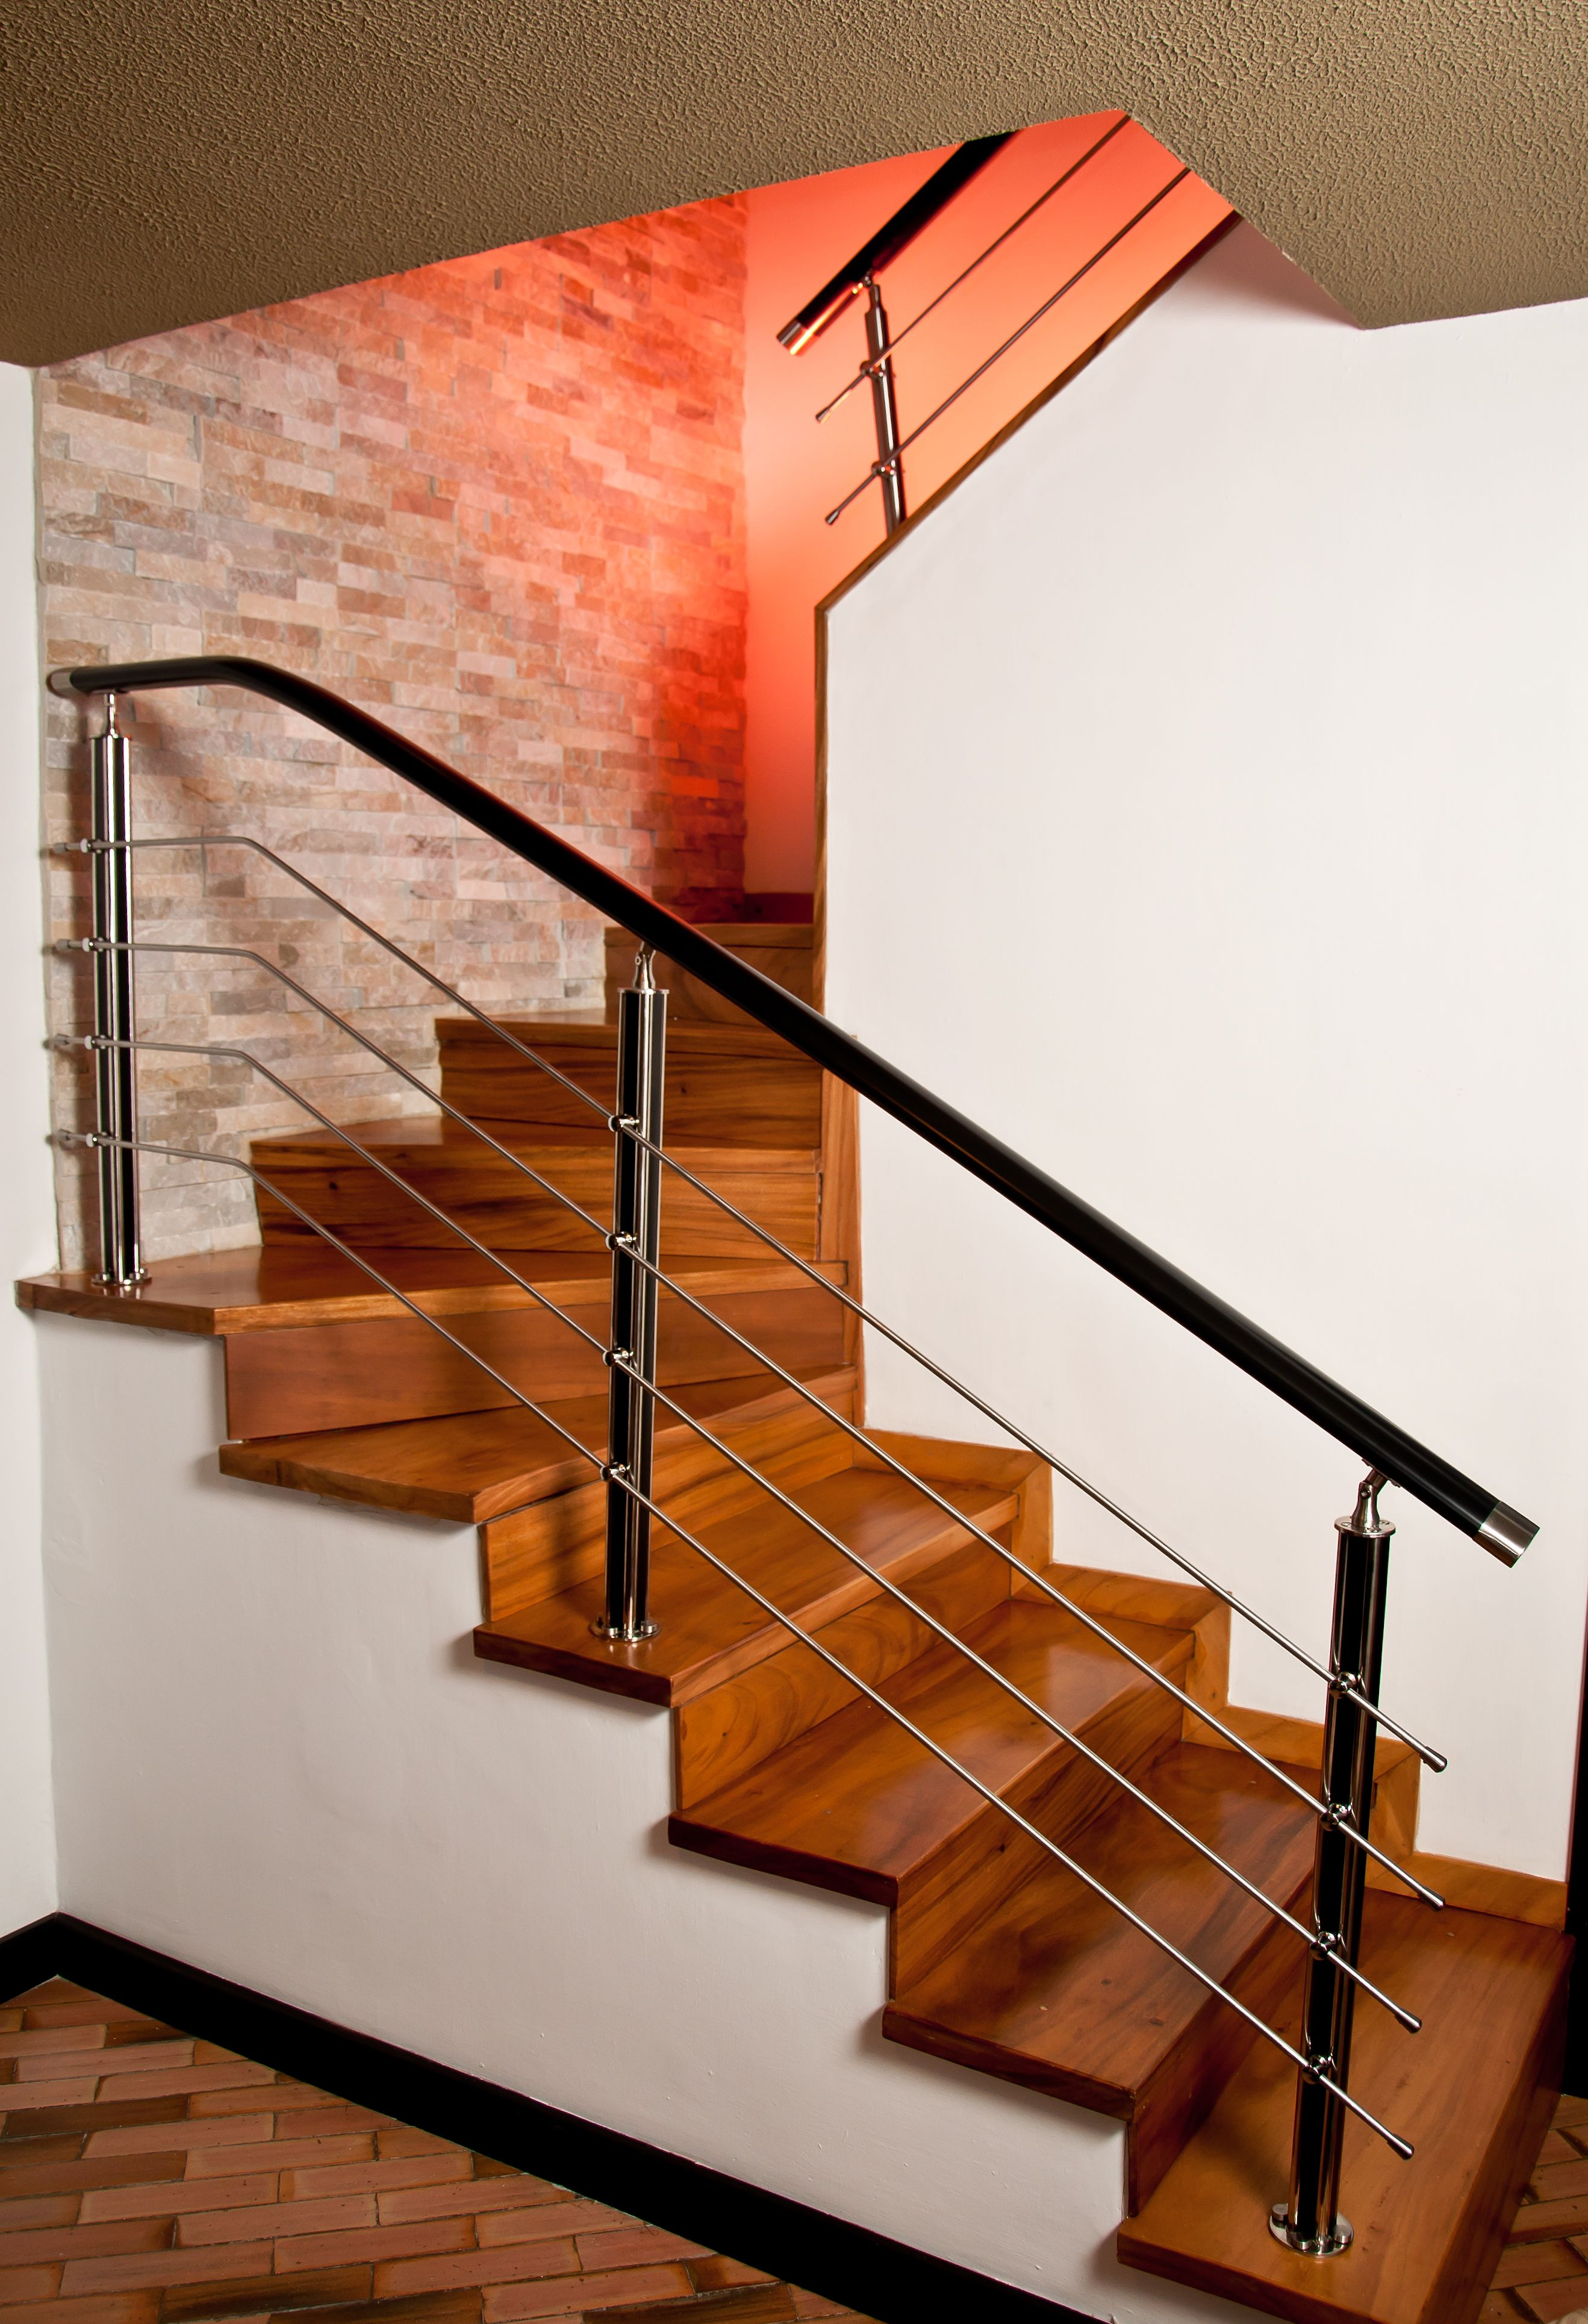 Pasamano de acero y resina decoraci n de hogar en 2019 - Fotos de escaleras modernas ...